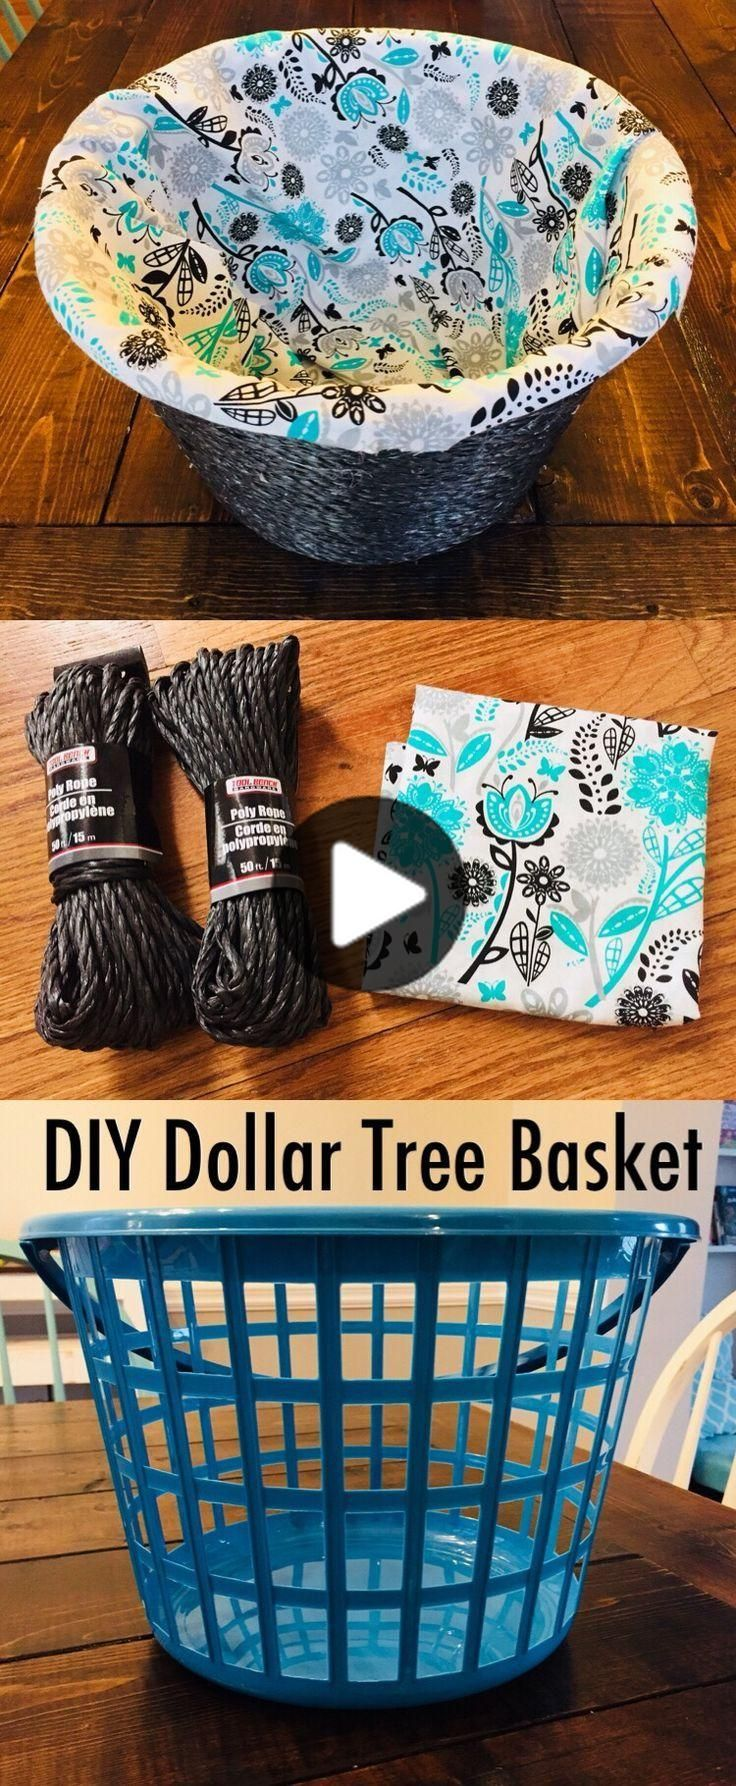 Diy dollar tree basket in 2020 dollar tree baskets